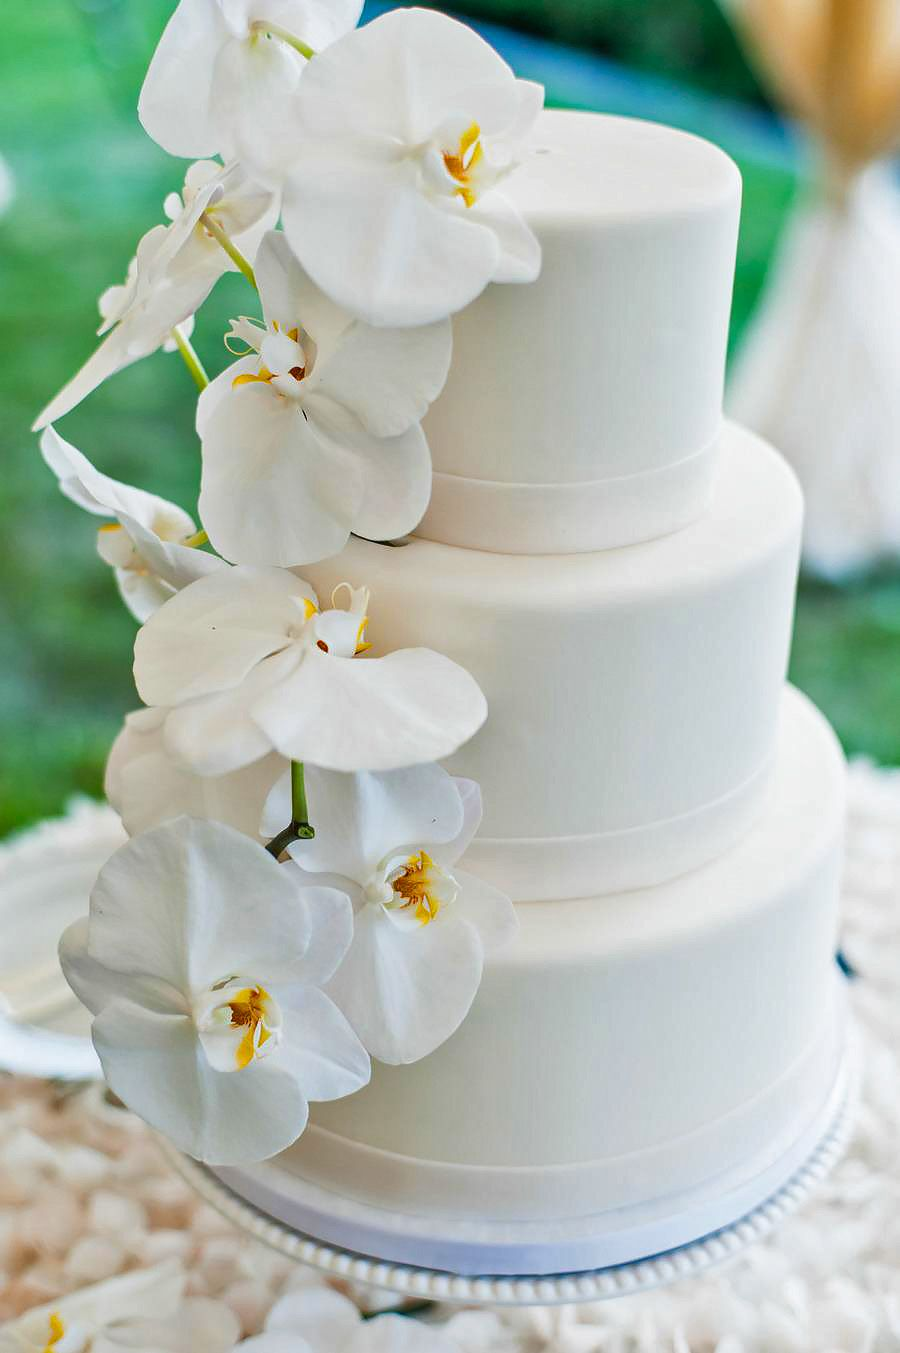 24 Tropical Wedding Cakes That Wow | Wedding cake, Cake and Weddings